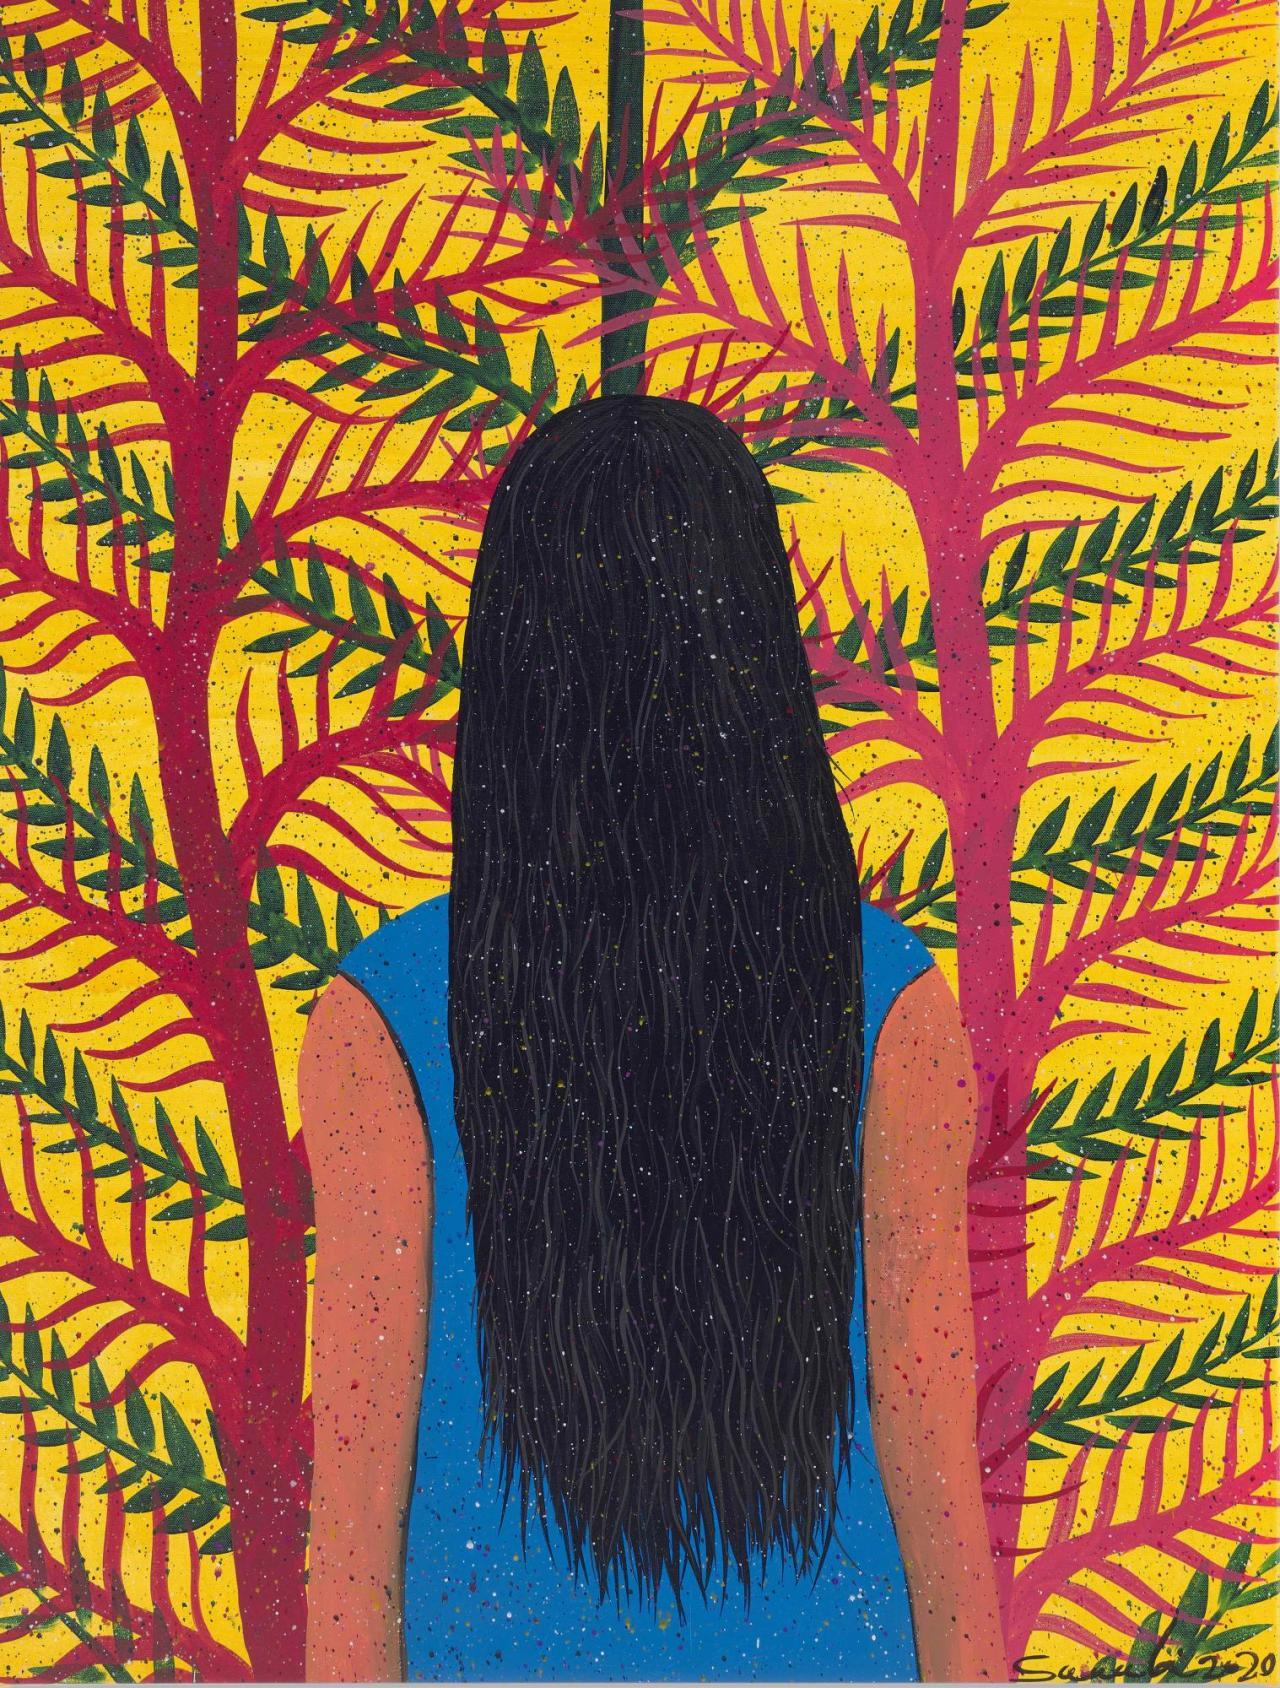 Mostafa Sarabi, Untitled , 2020, Acrylic on canvas, 130 x 95 cm